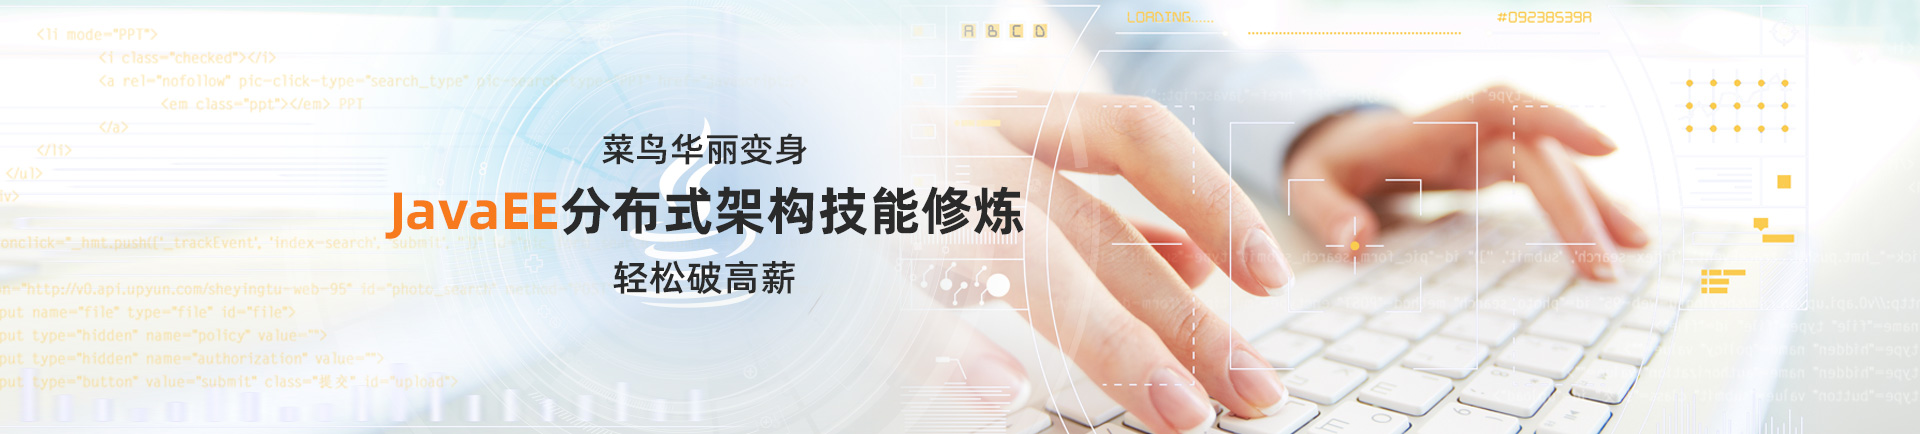 04-JavaEE分布式架构技能修炼